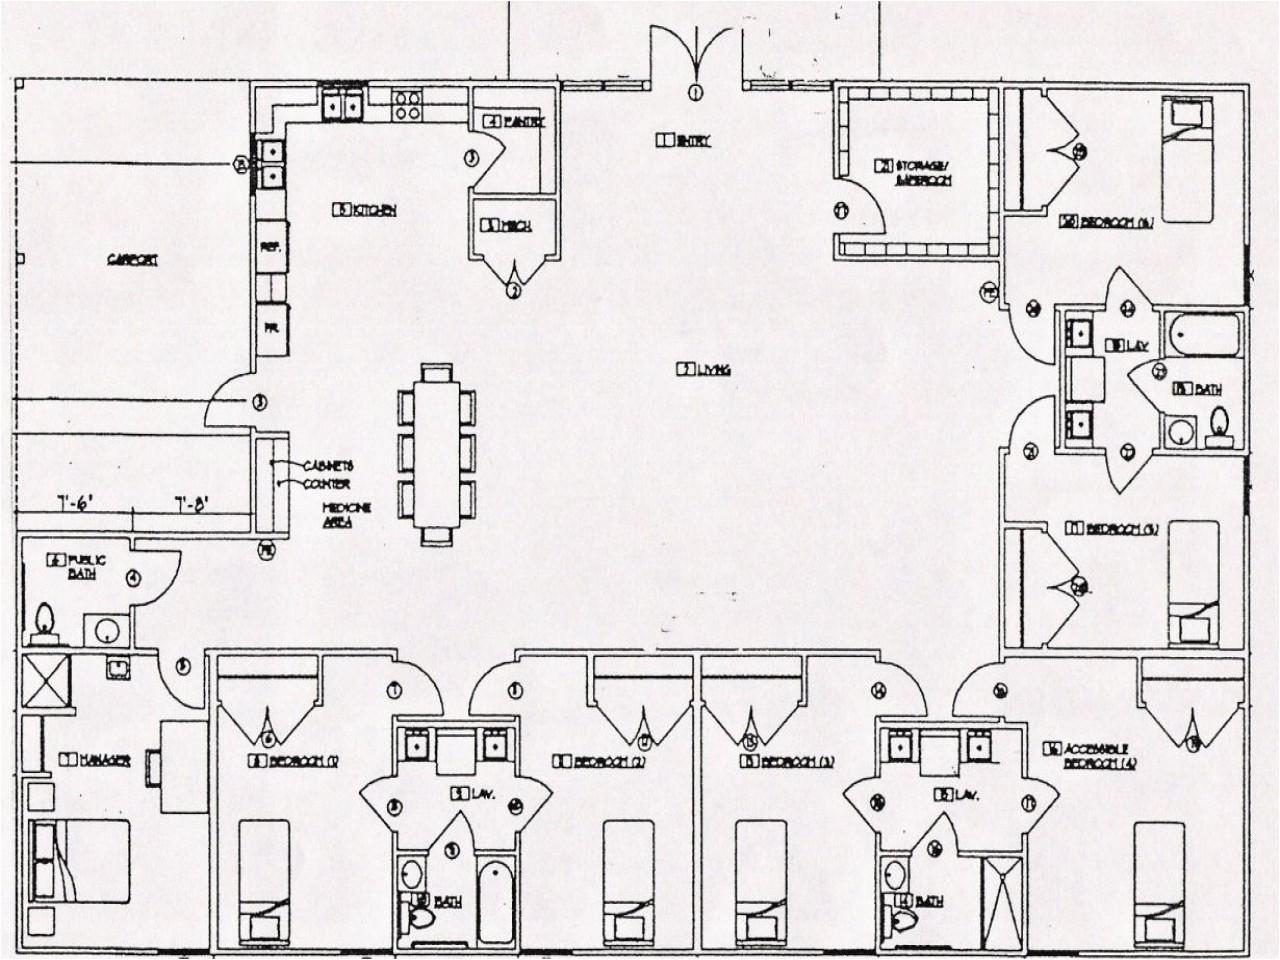 5f3d7bcd97cef130 basic house floor plans simple square house plans